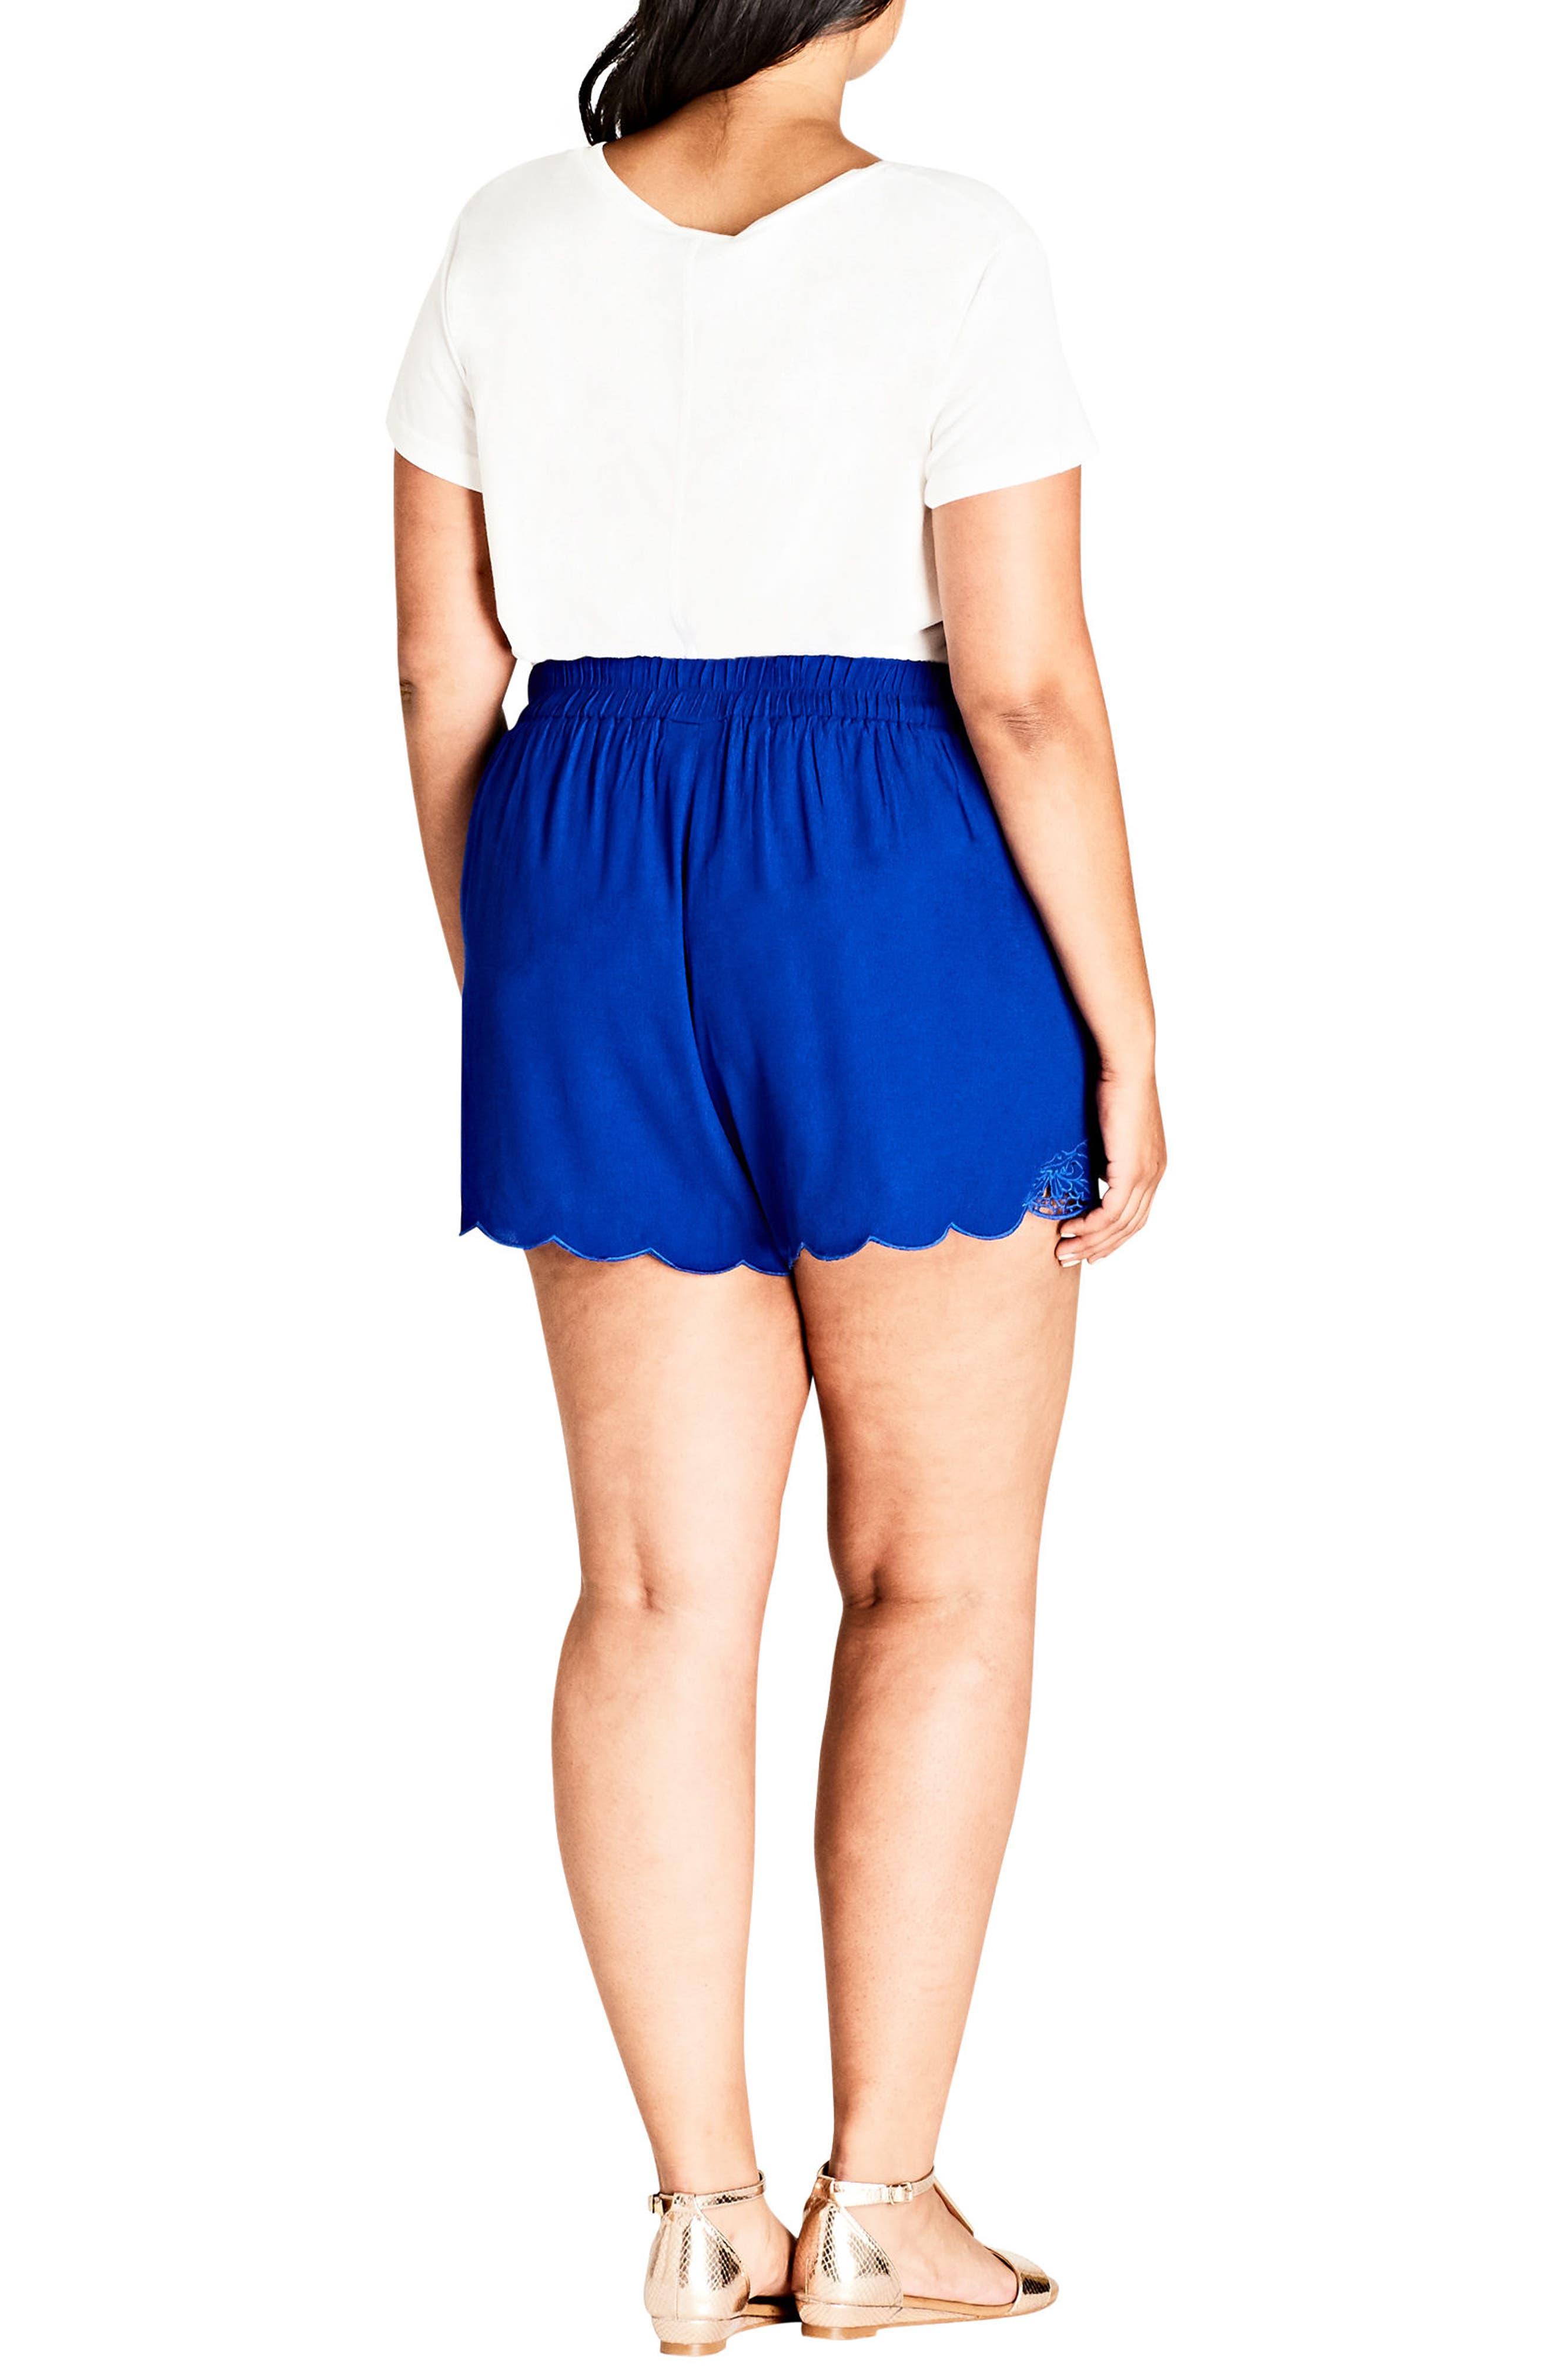 Scalloped Lace Shorts,                             Alternate thumbnail 2, color,                             408